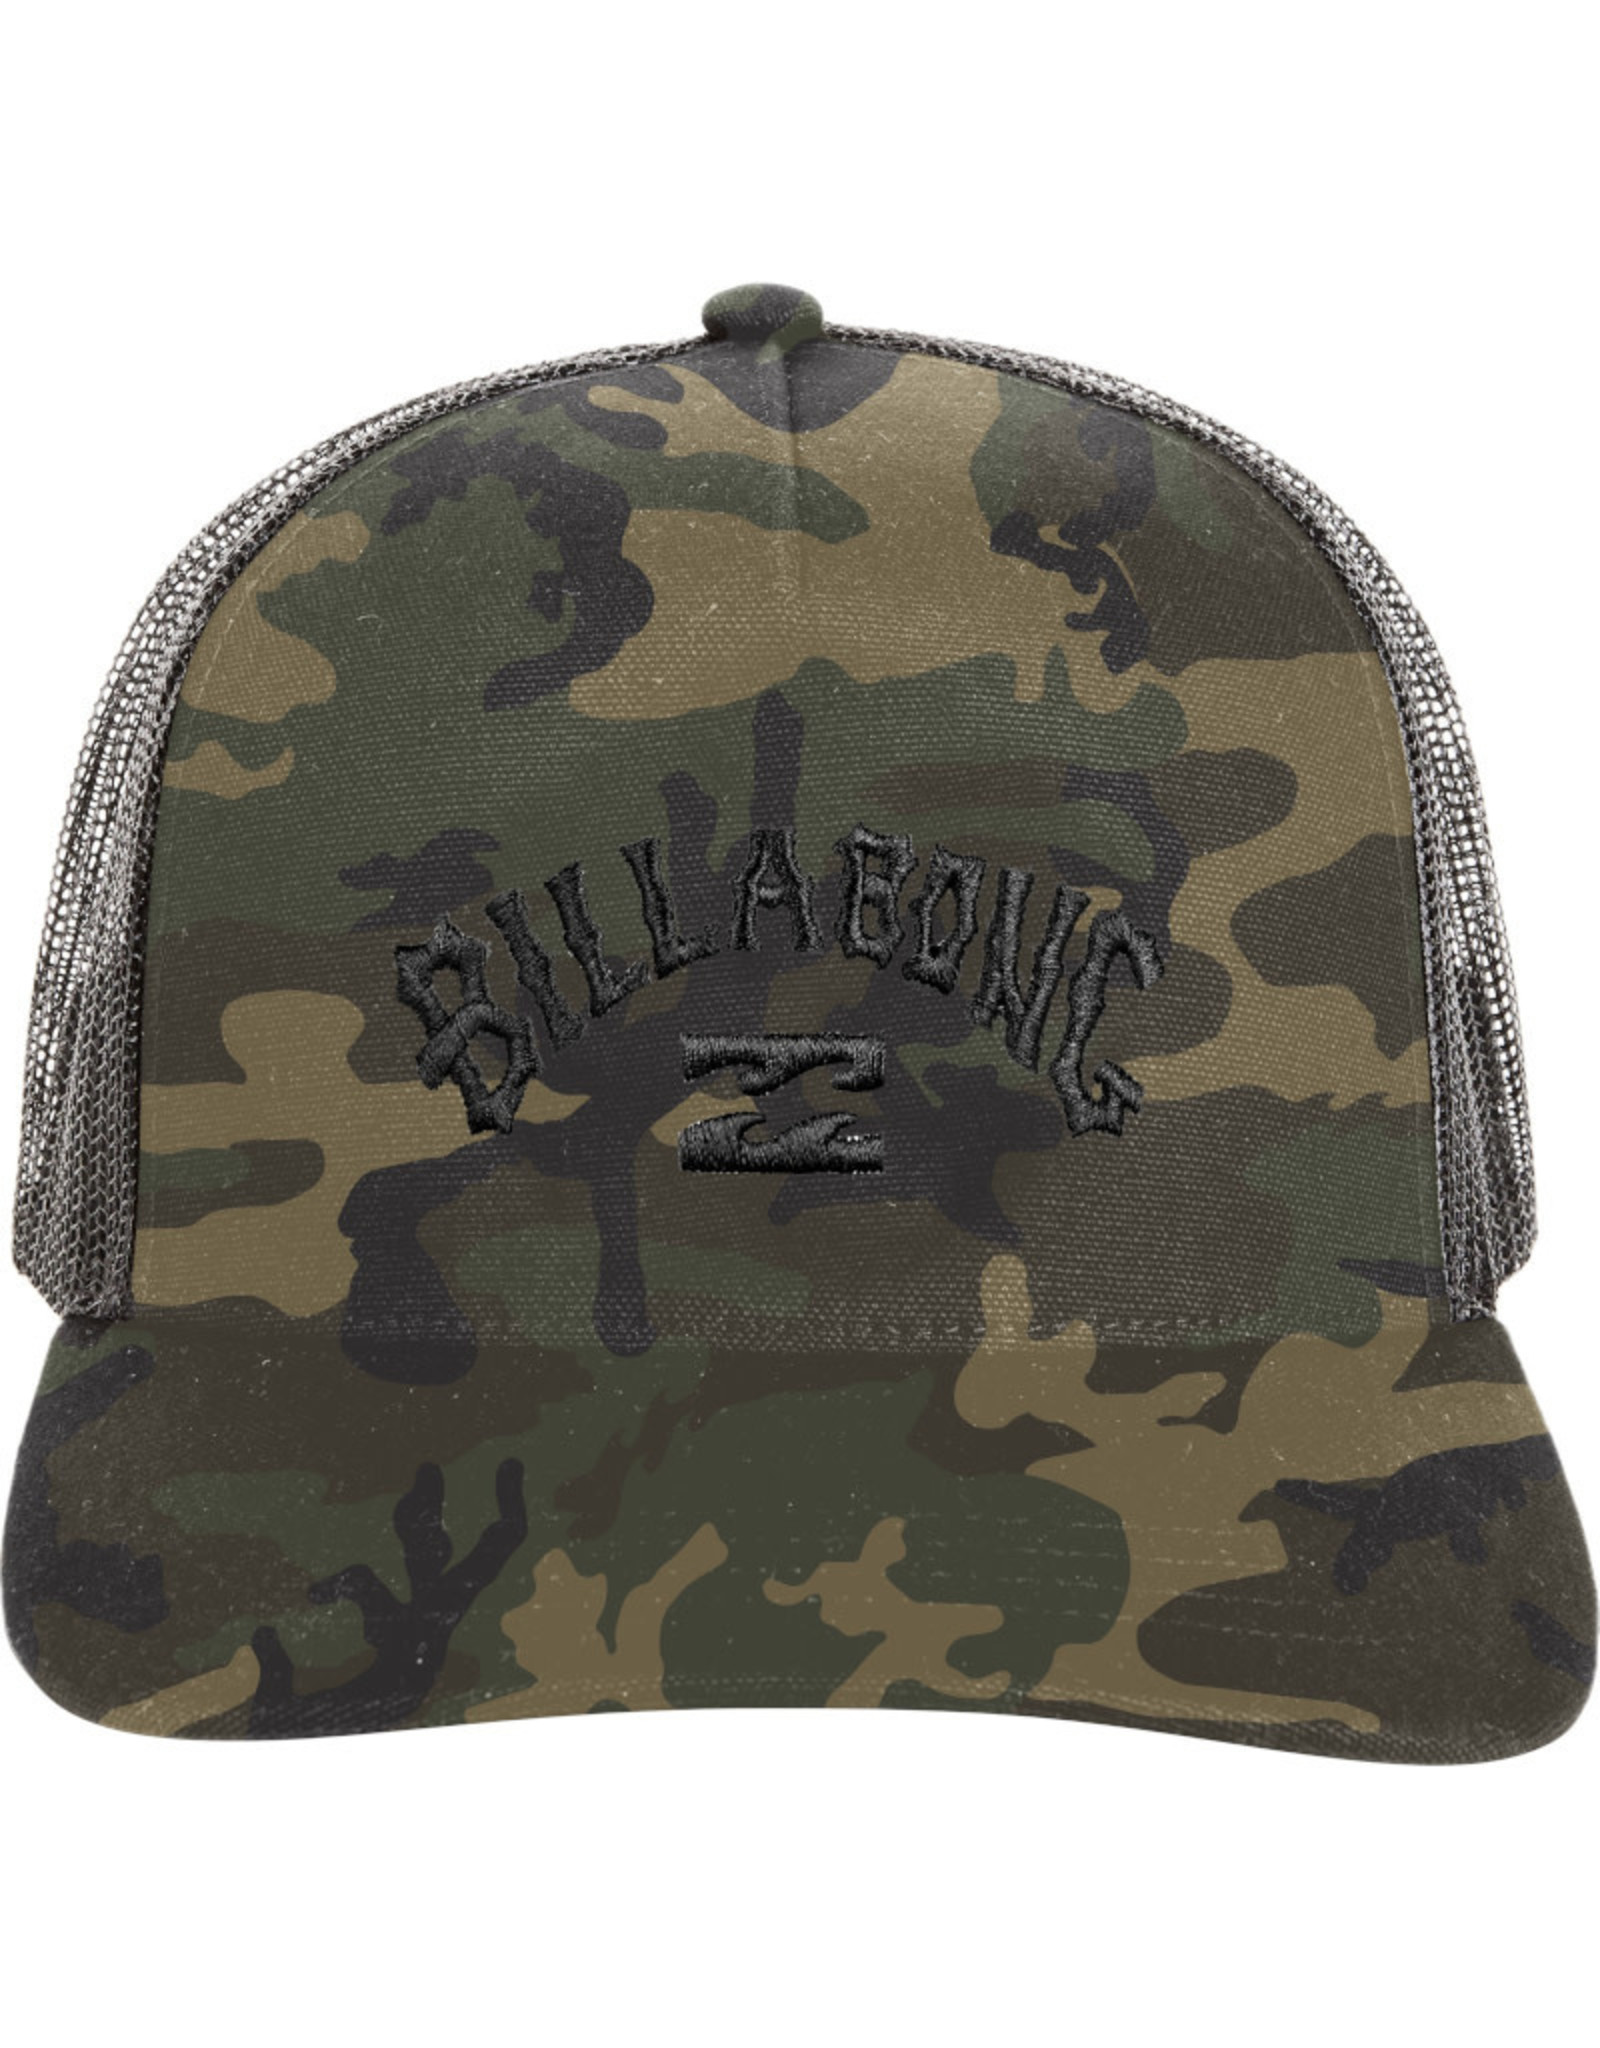 Billabong Billabong Flatwall Camo Cap